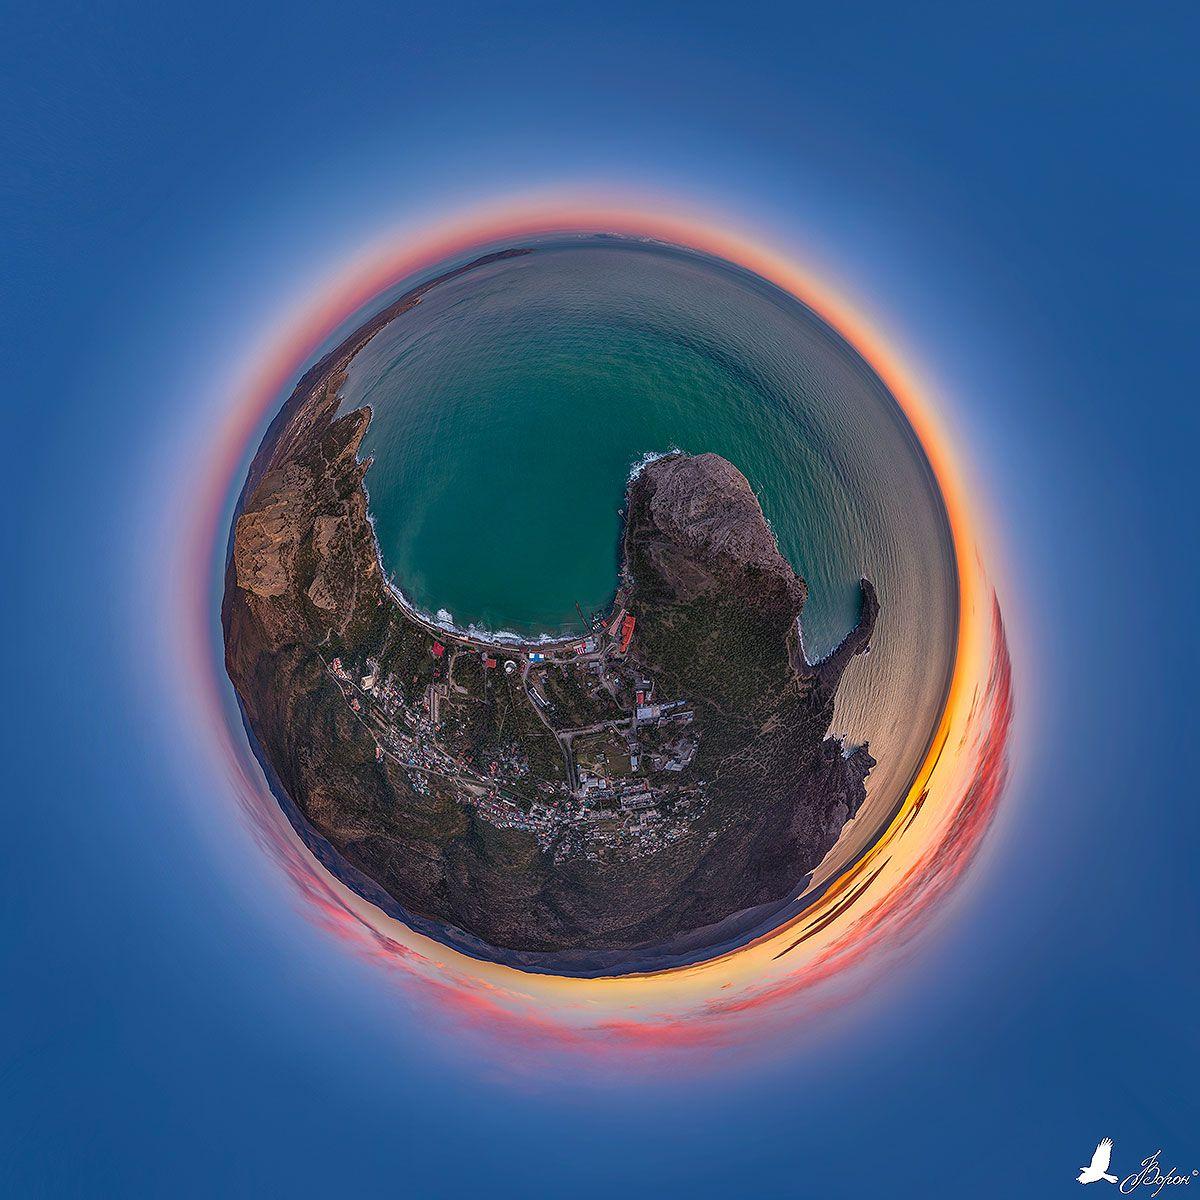 [Sphere-0]-DJI_0741_DJI_0822-62-images.jpg